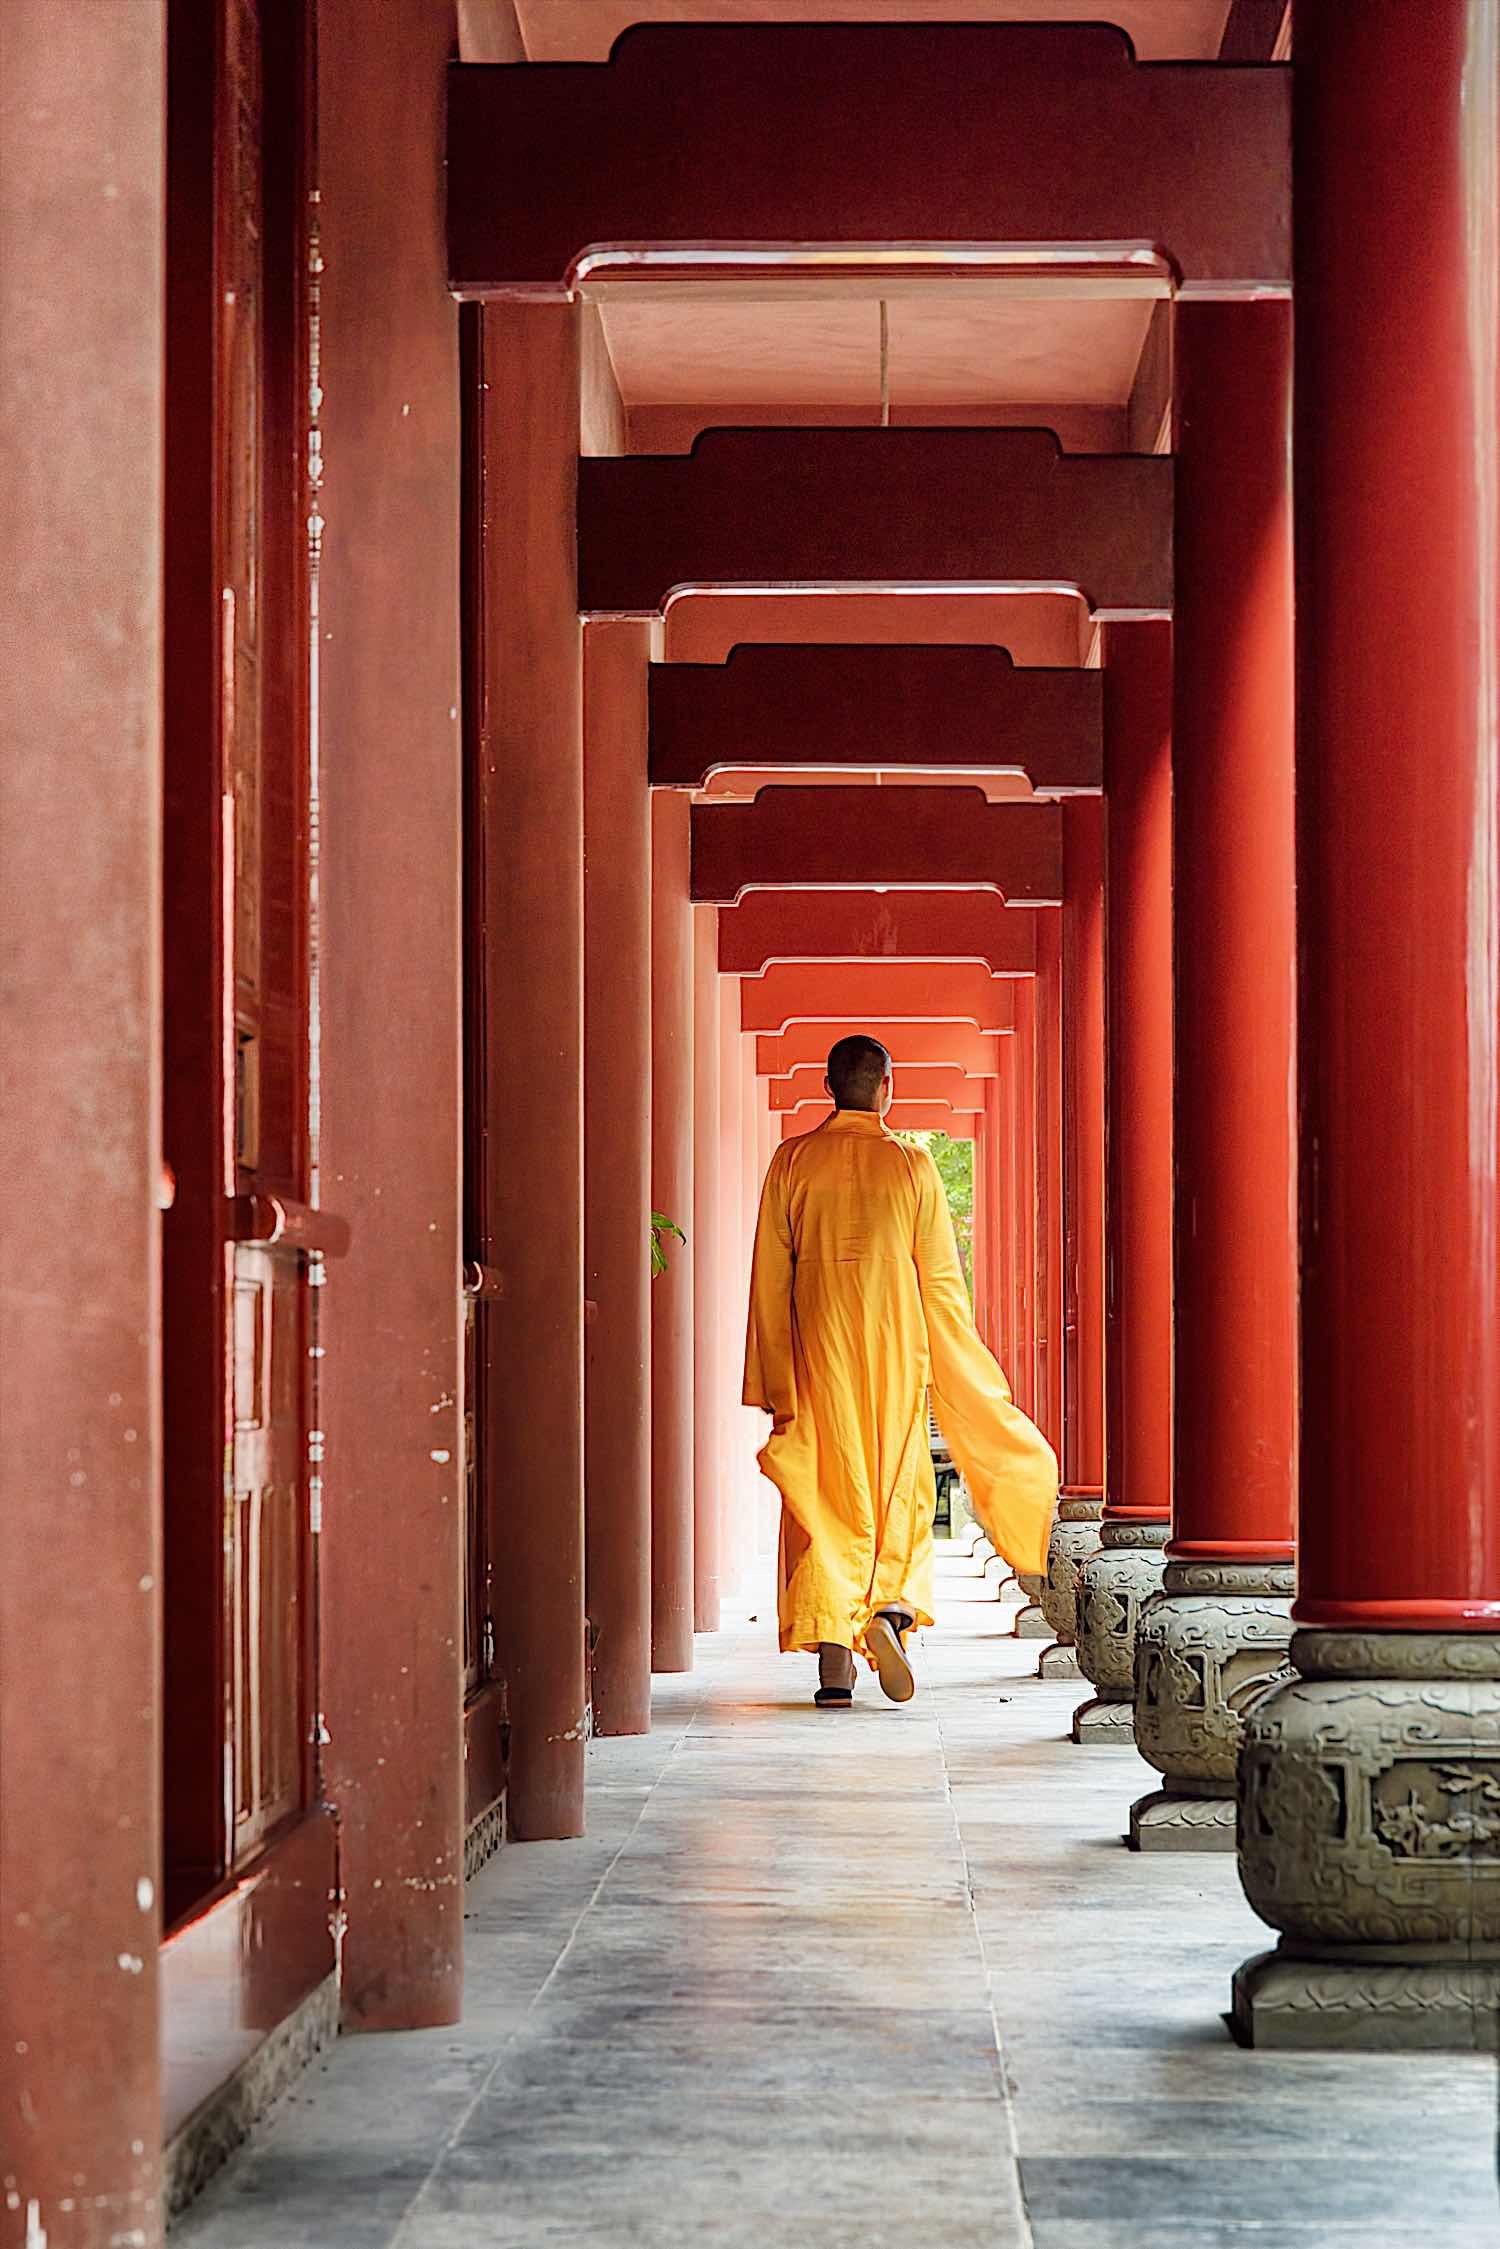 Buddha Weekly Walking Meditation at Monastery Buddhism